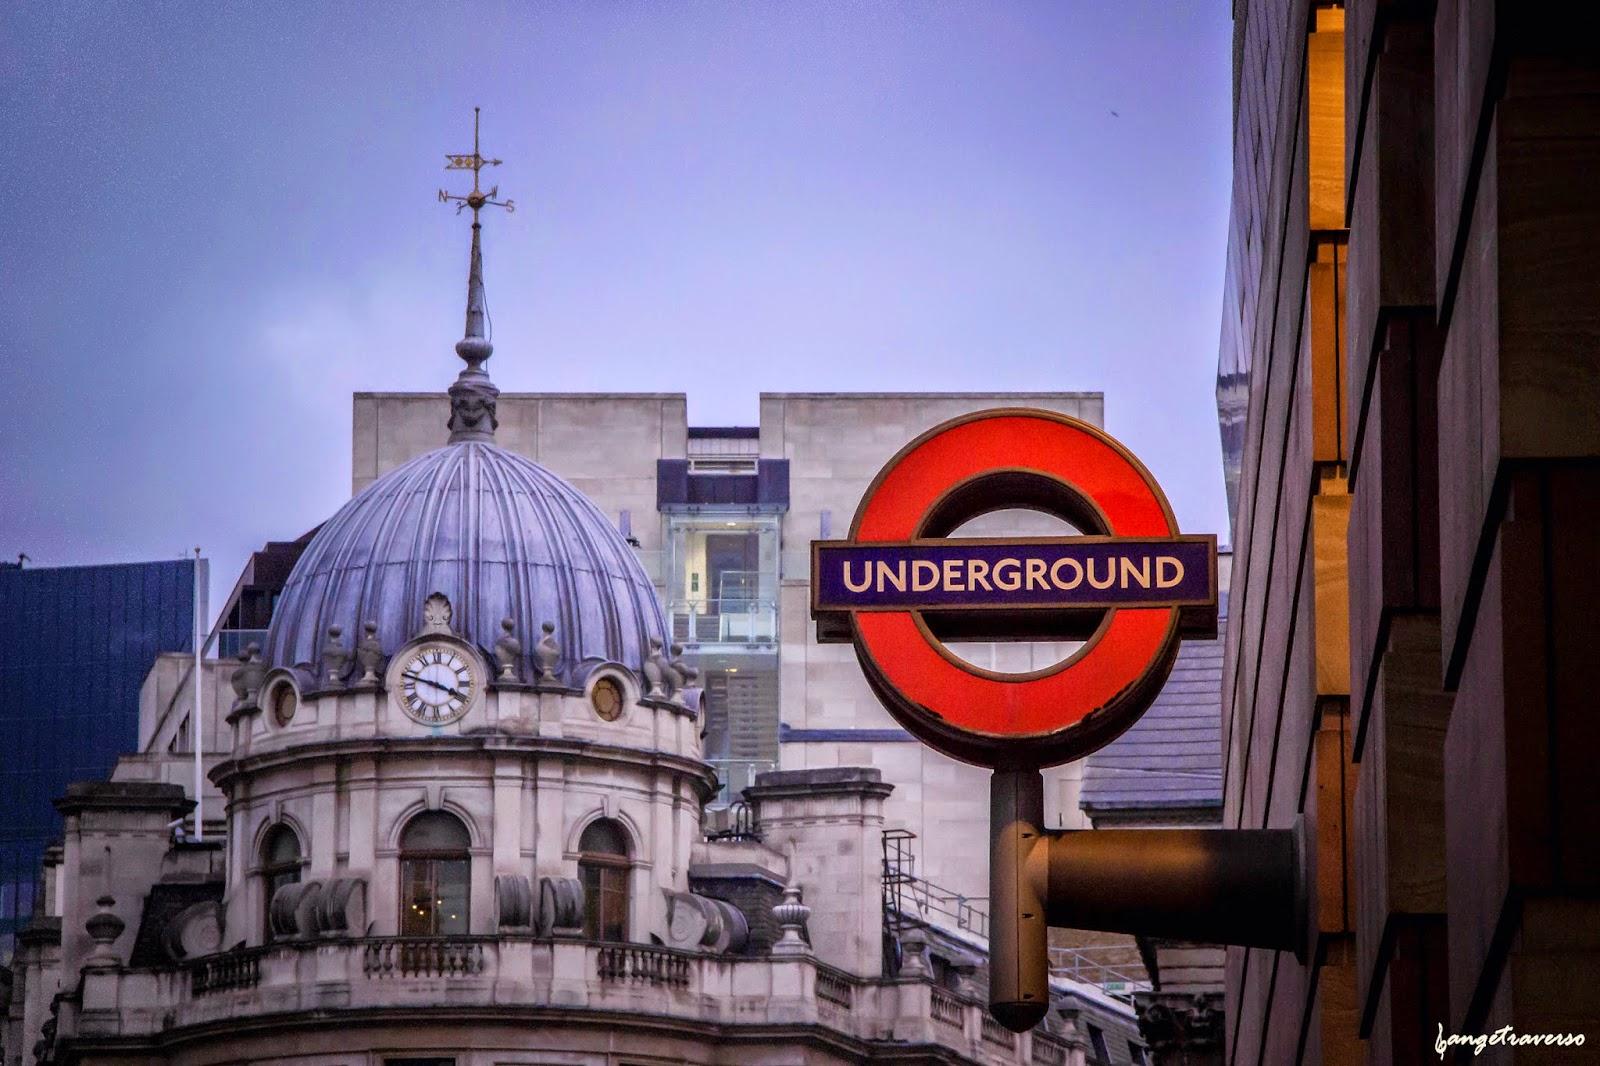 Underground, City of London